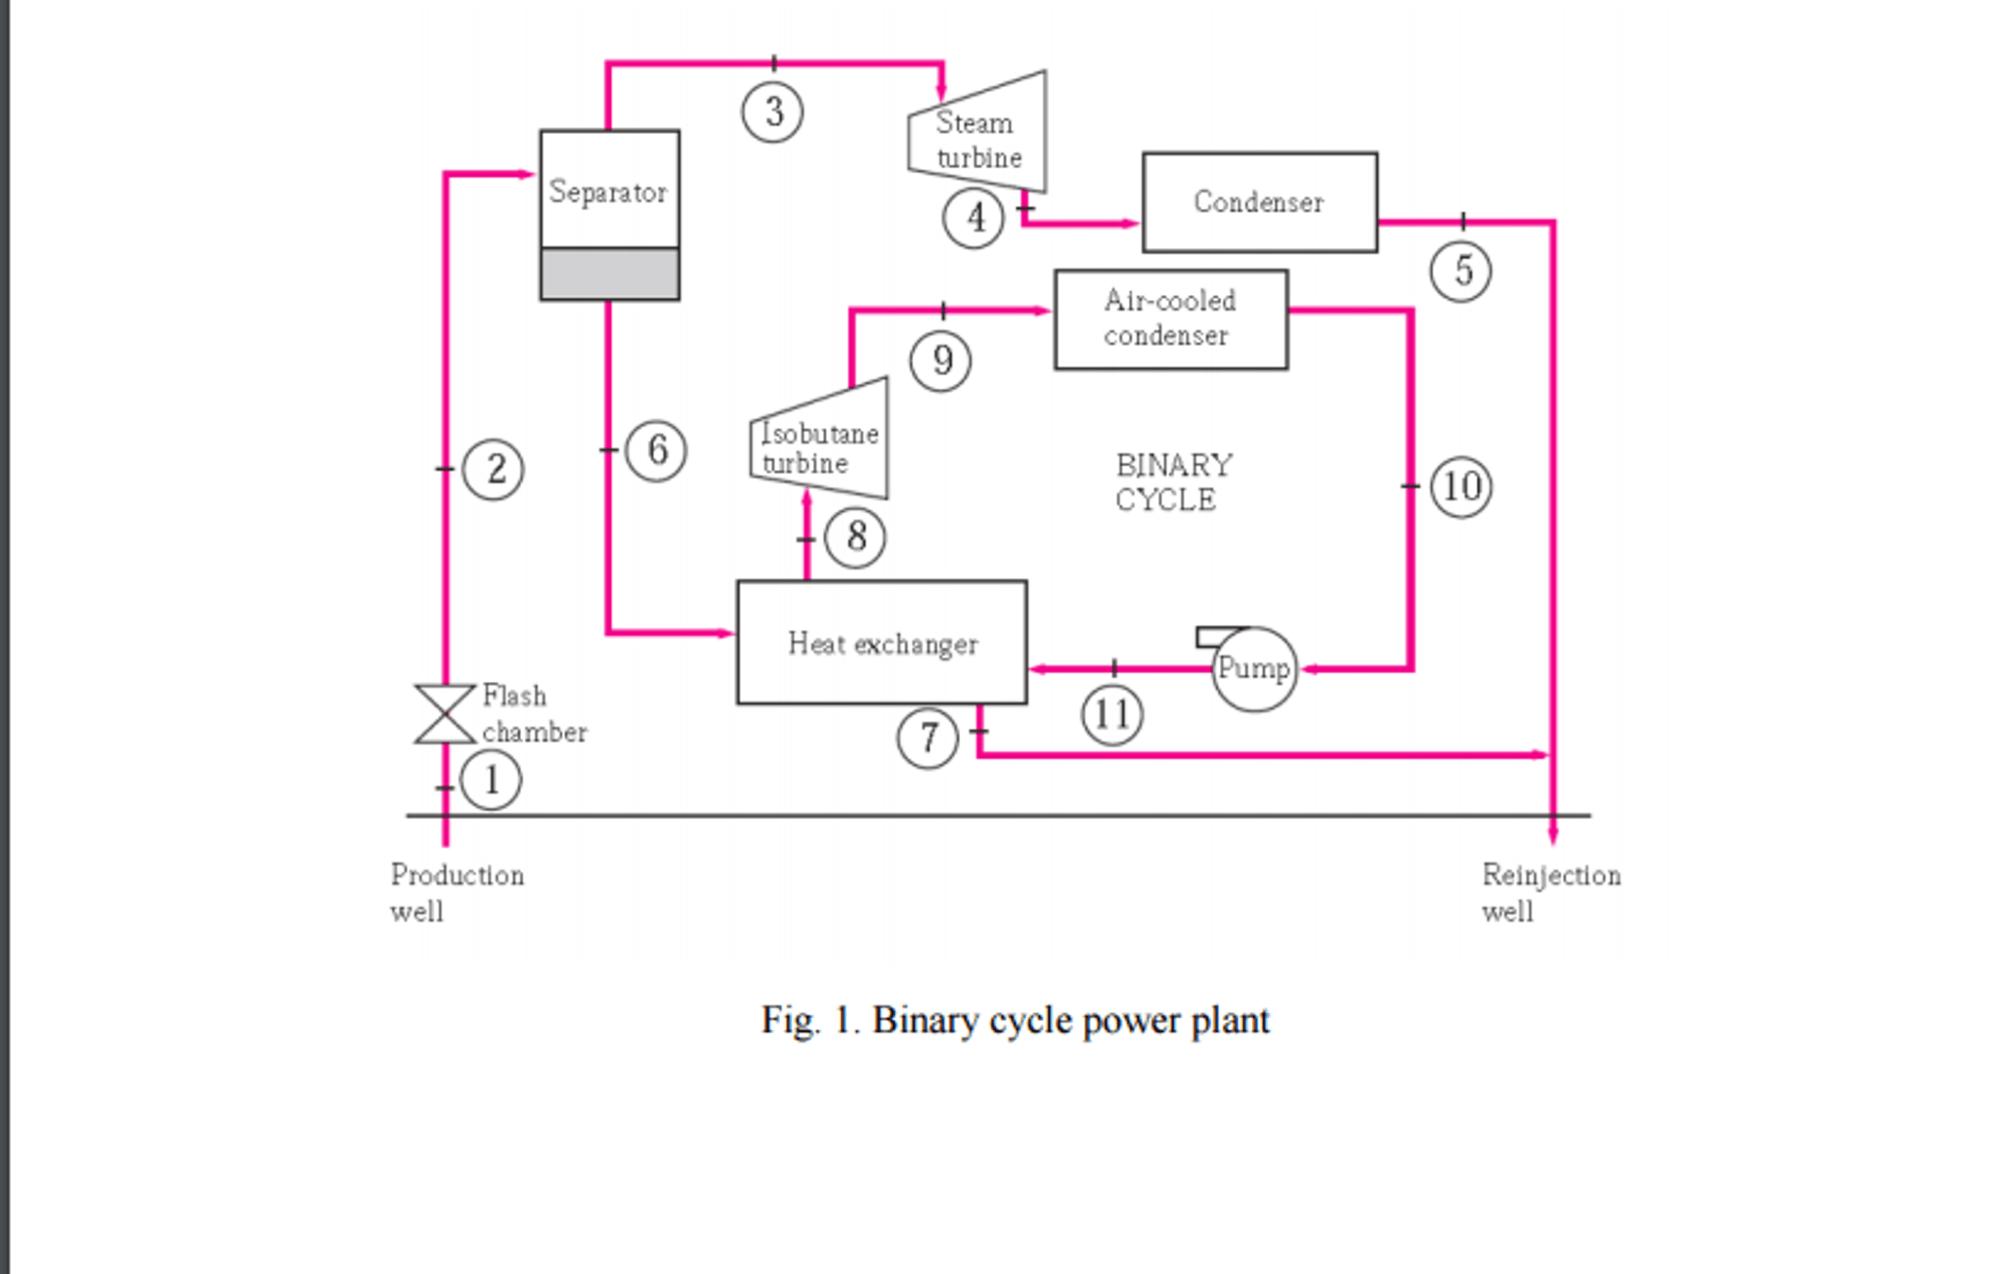 hight resolution of steam turbine t separator condenser ir cooled cond